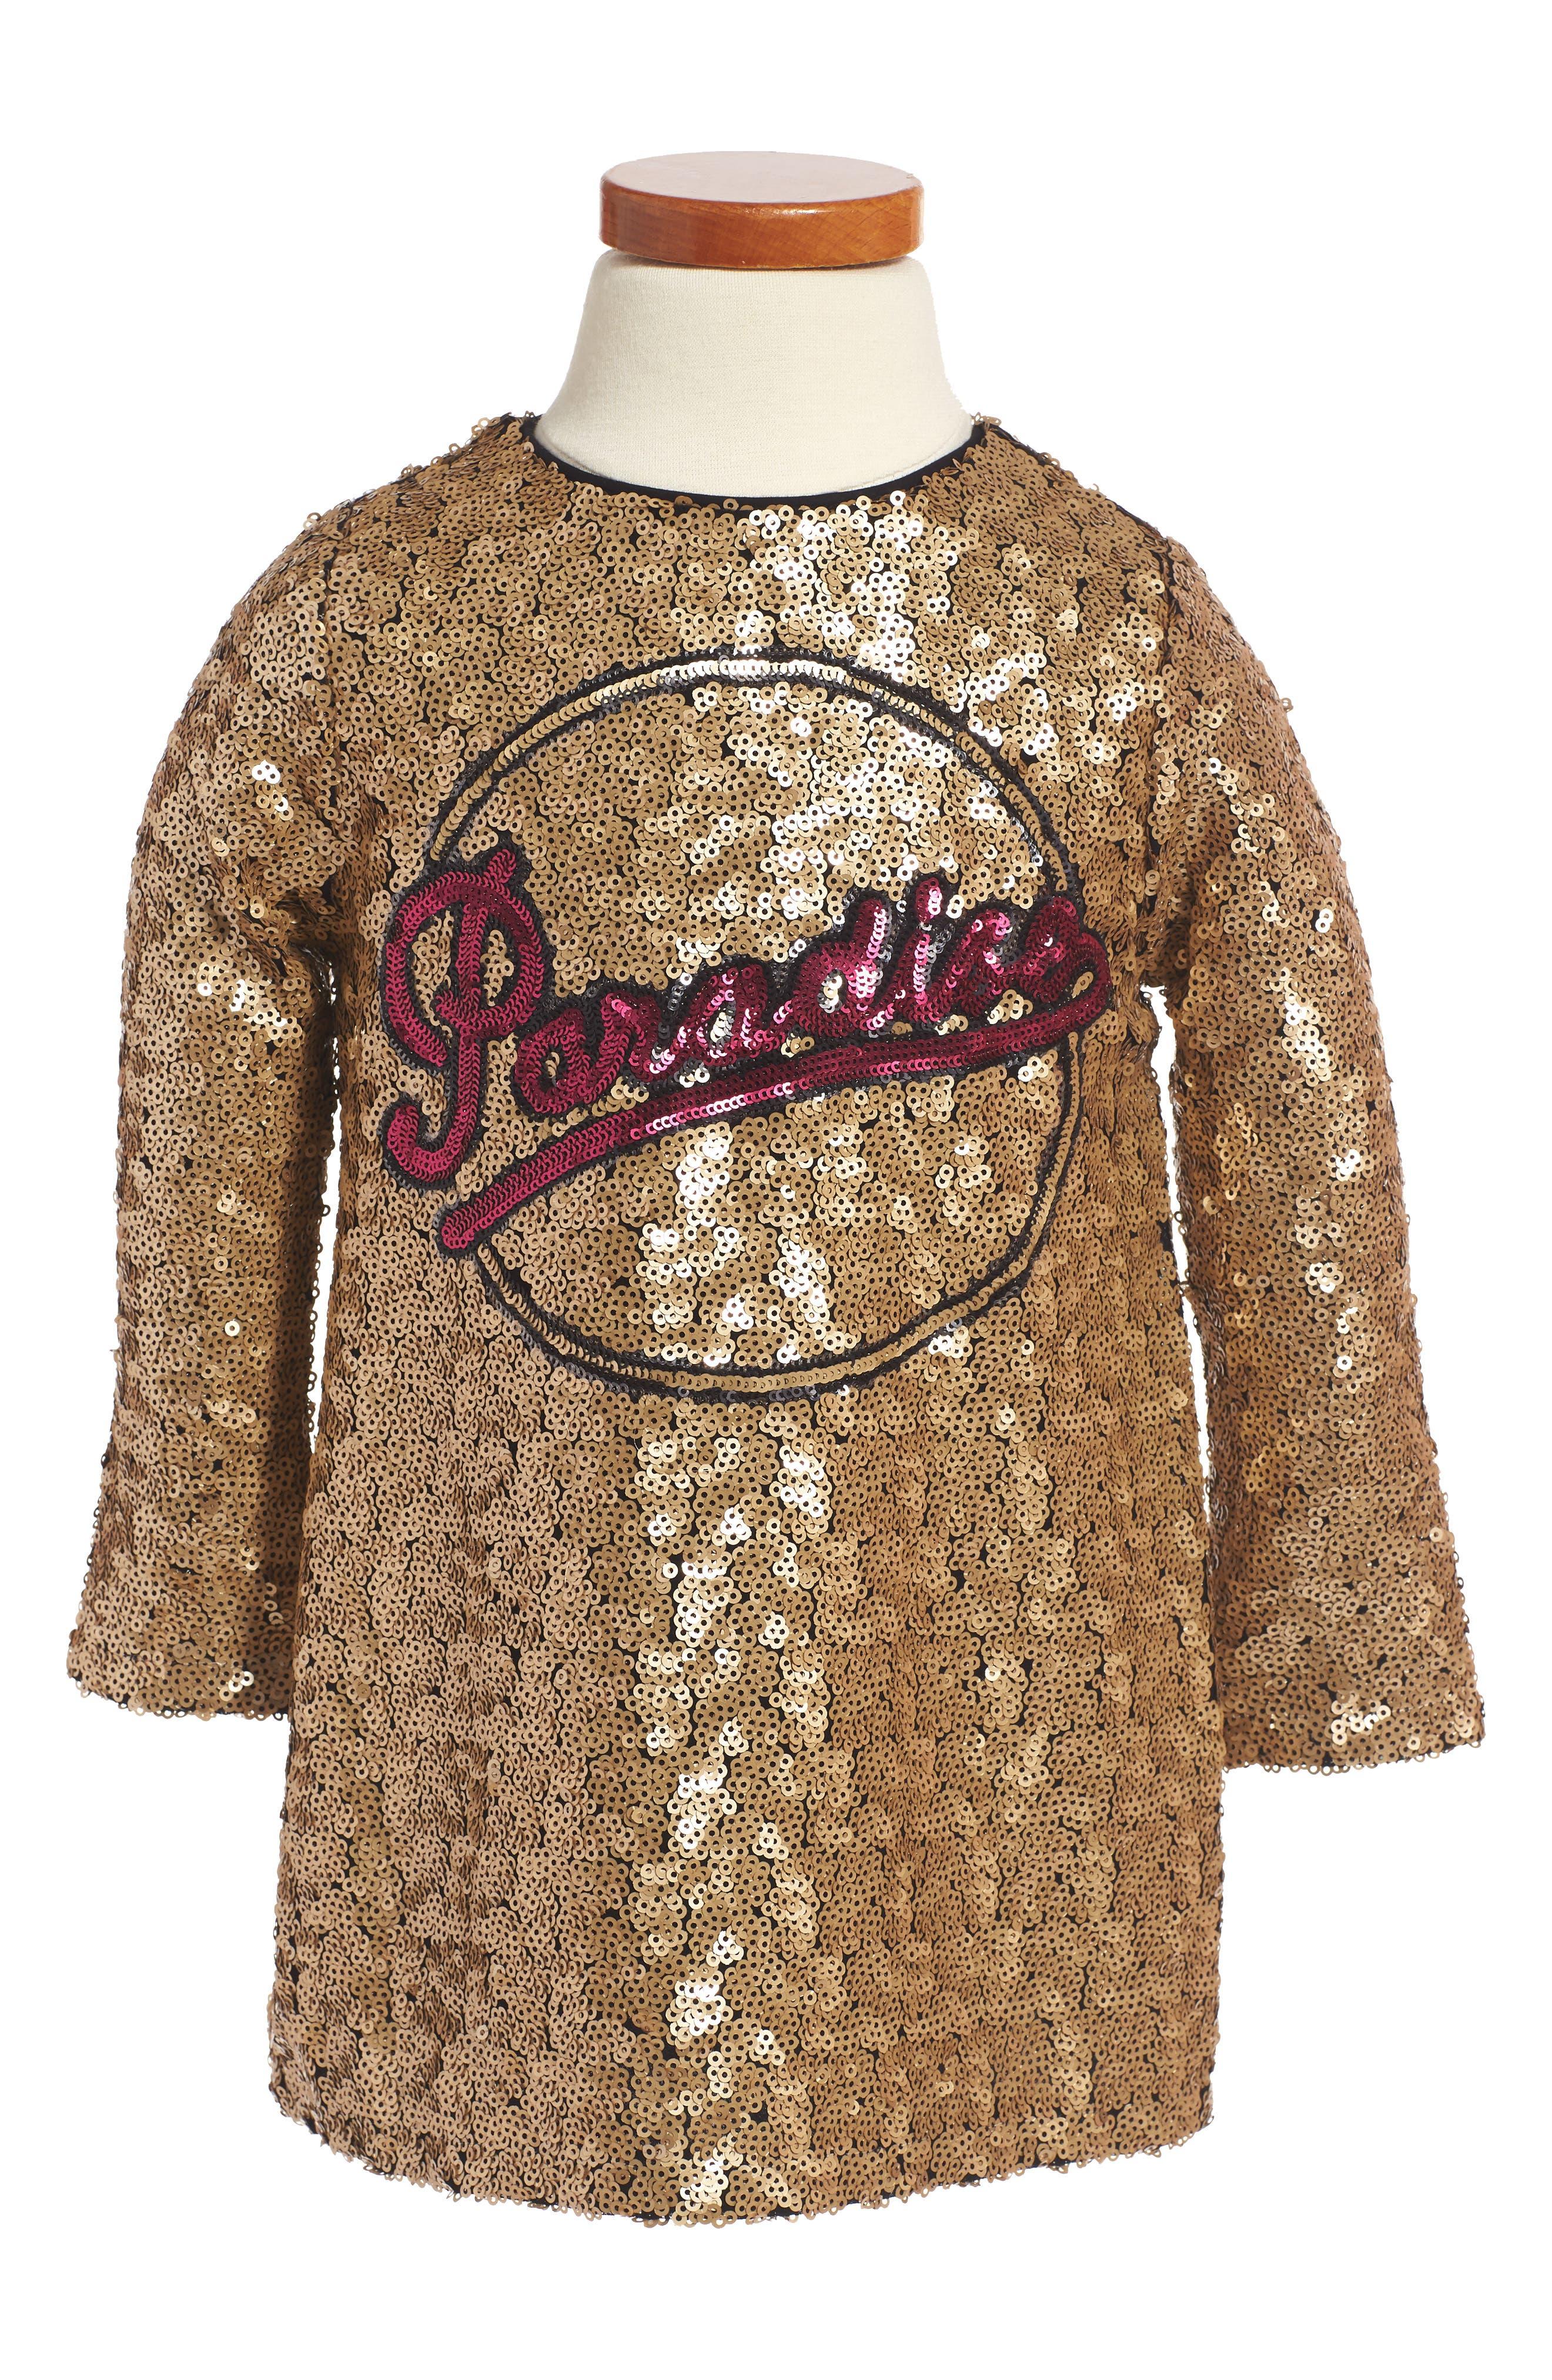 Alternate Image 1 Selected - LITTLE MARC JACOBS Paradise Sequin Shift Dress (Toddler Girls, Little Girls & Big Girls)